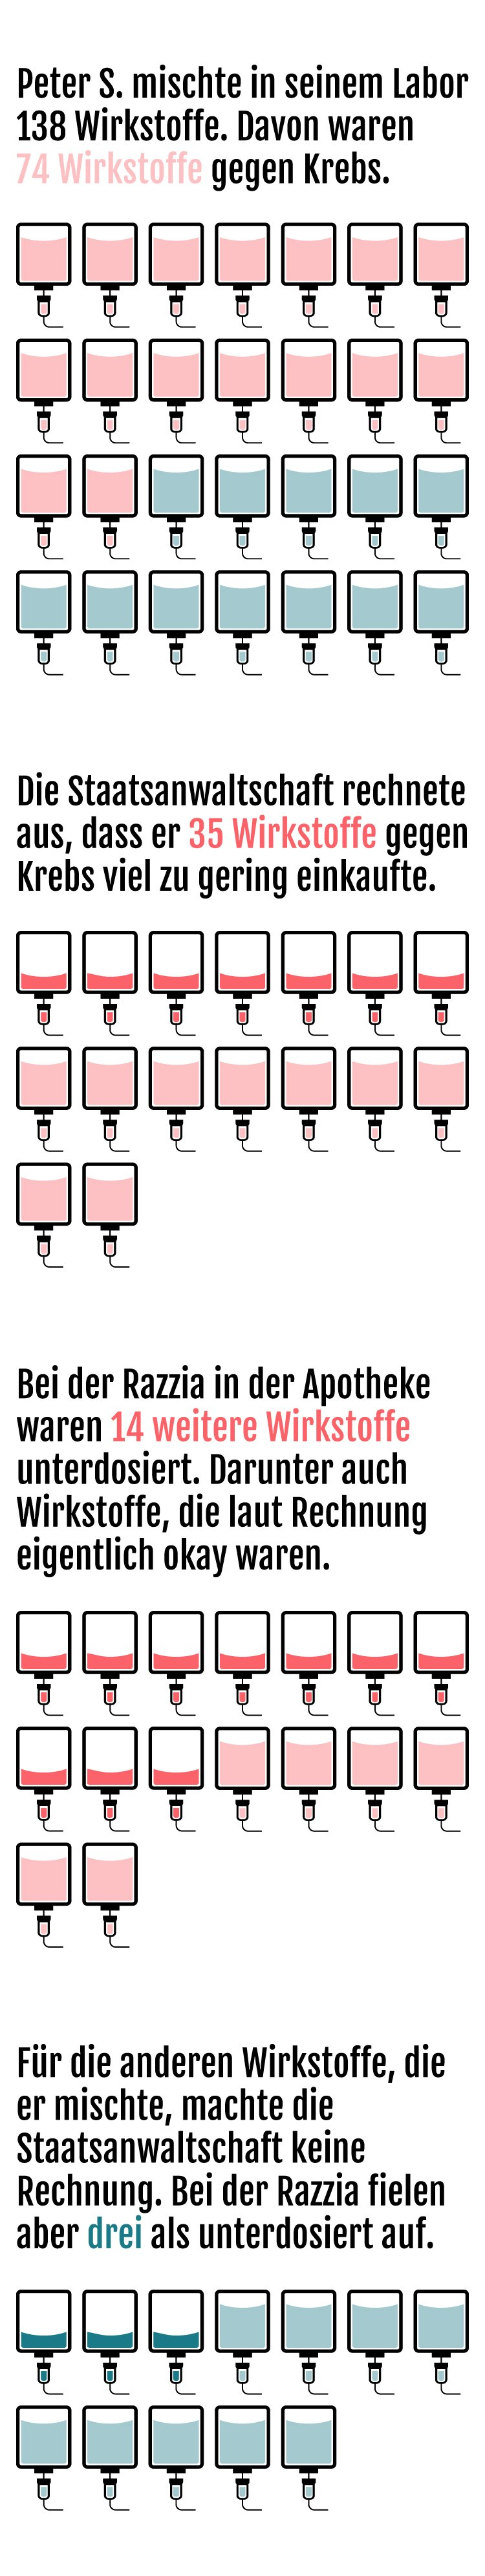 Infografik_Gesamt.jpg